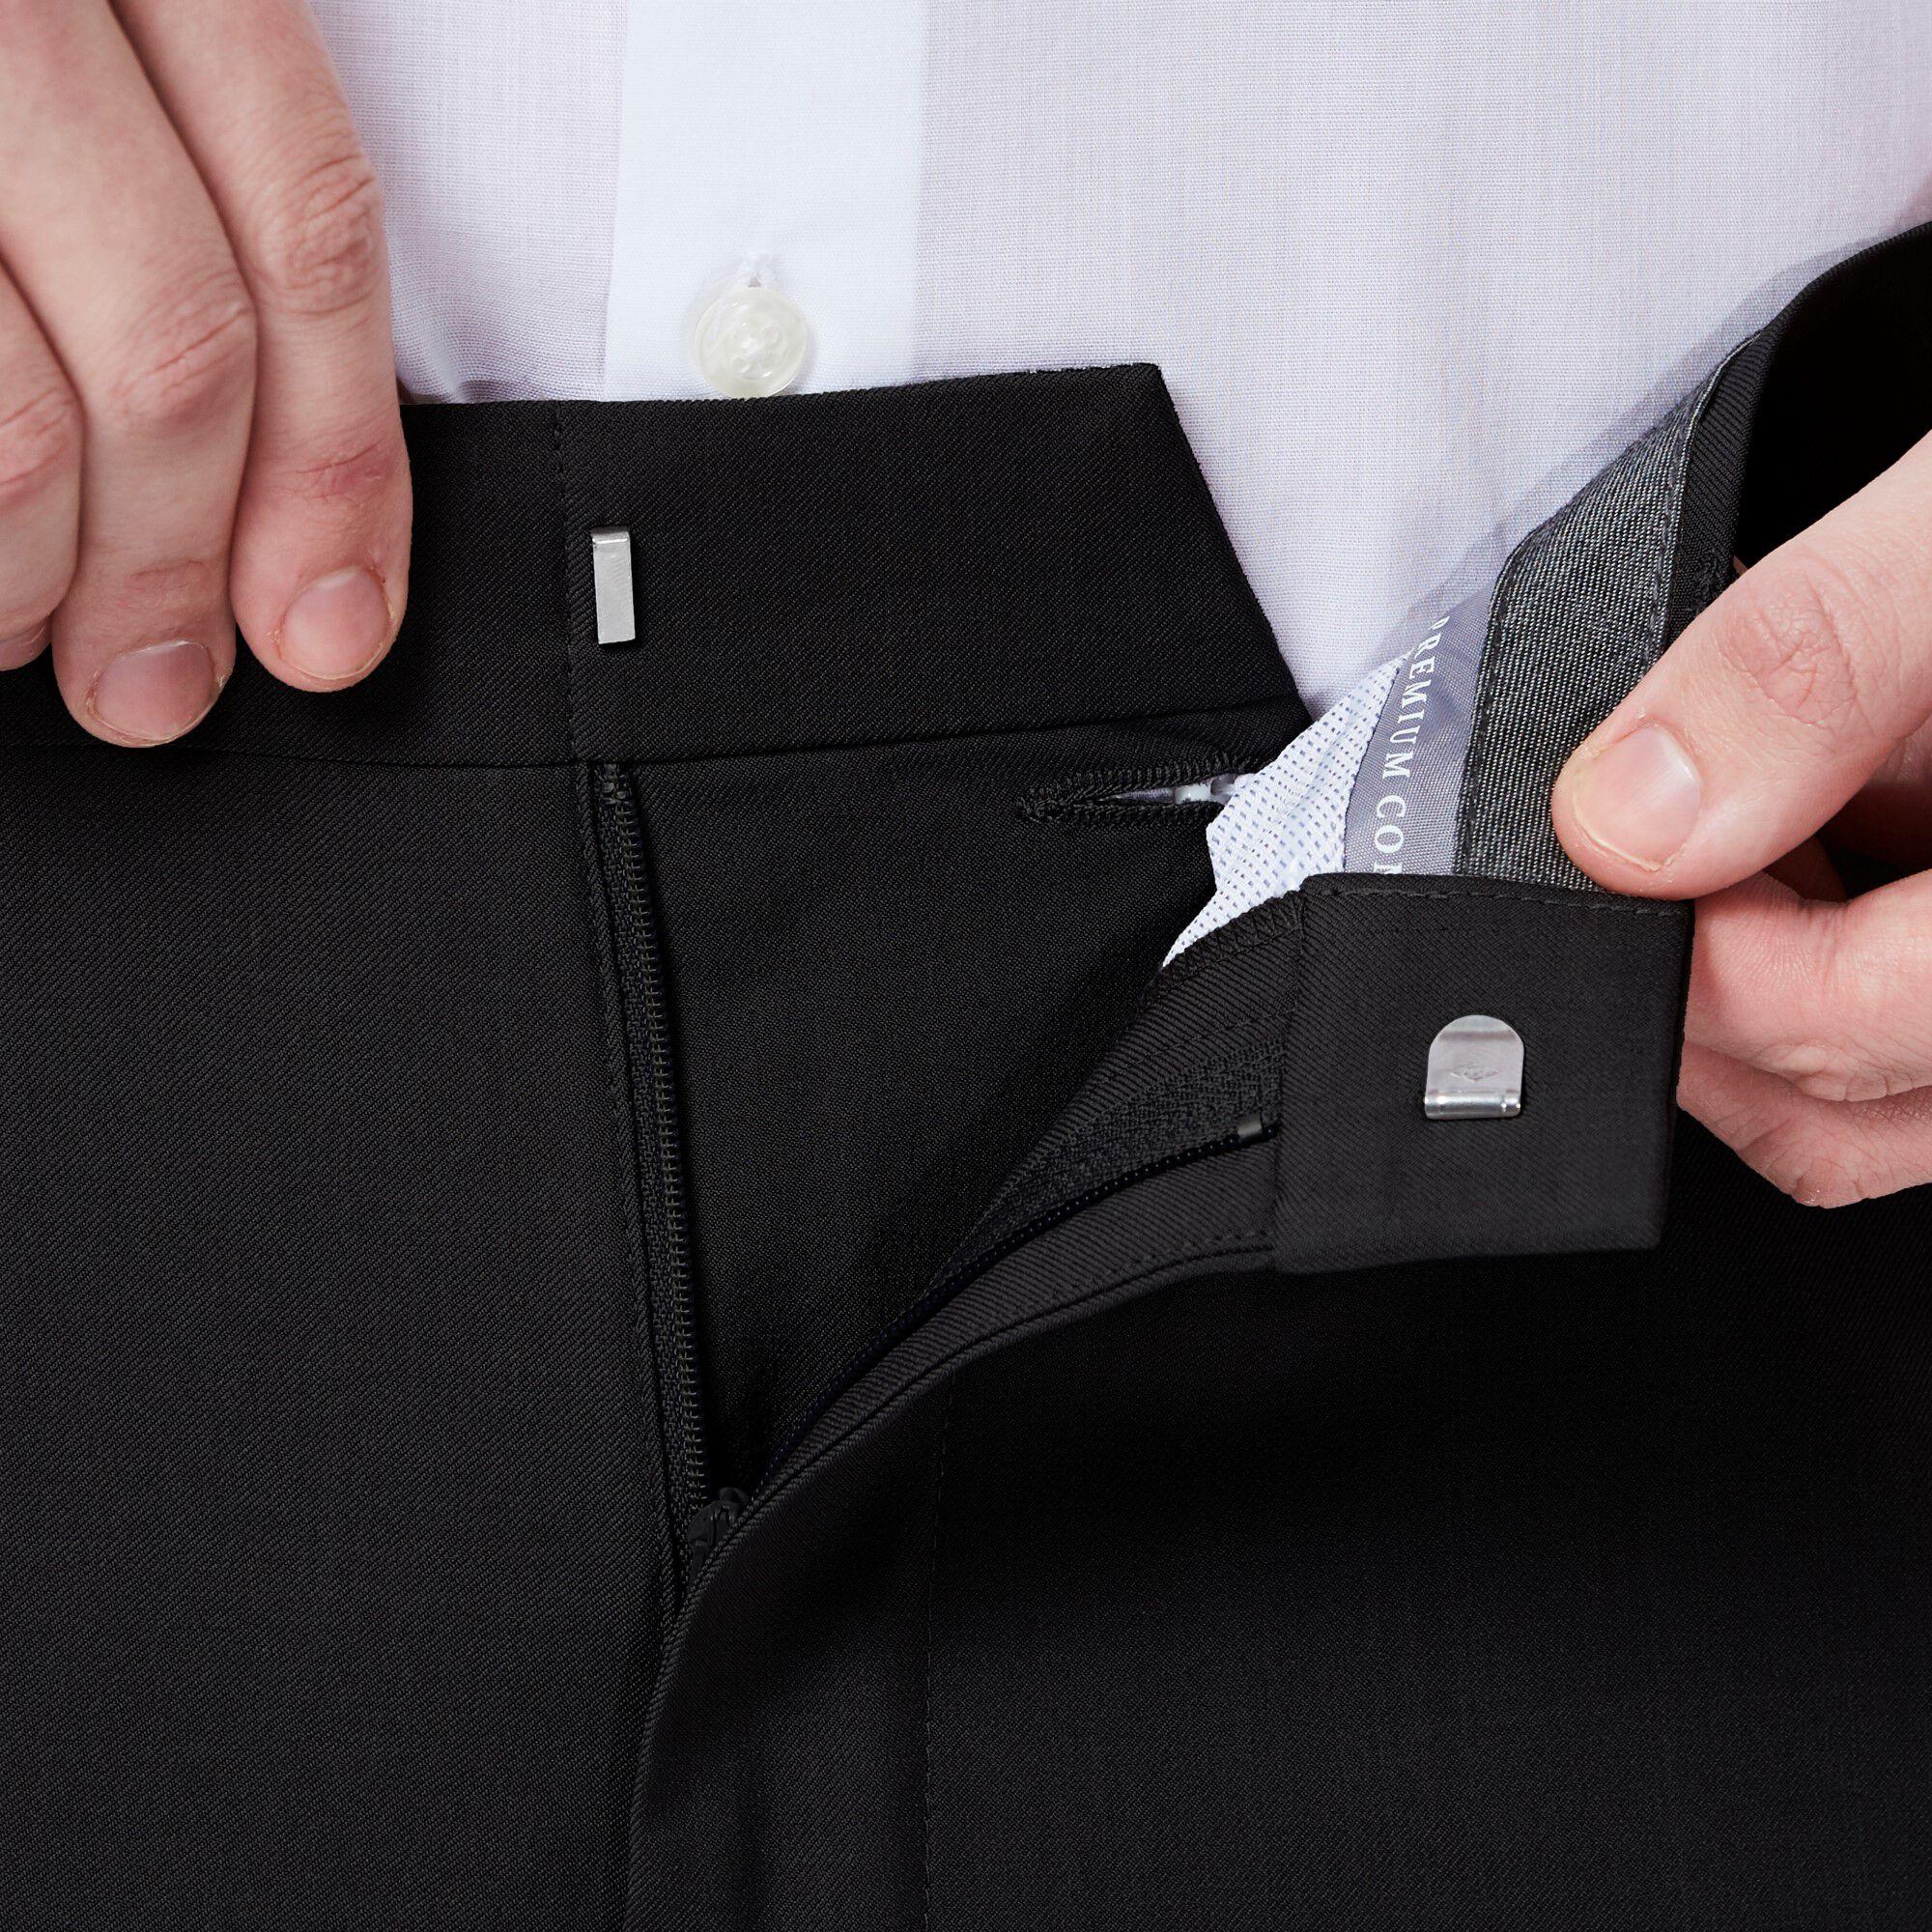 big front comforter comfort fit pant waist classic amp premium tall hidden expandable flat dress jeans waistband and